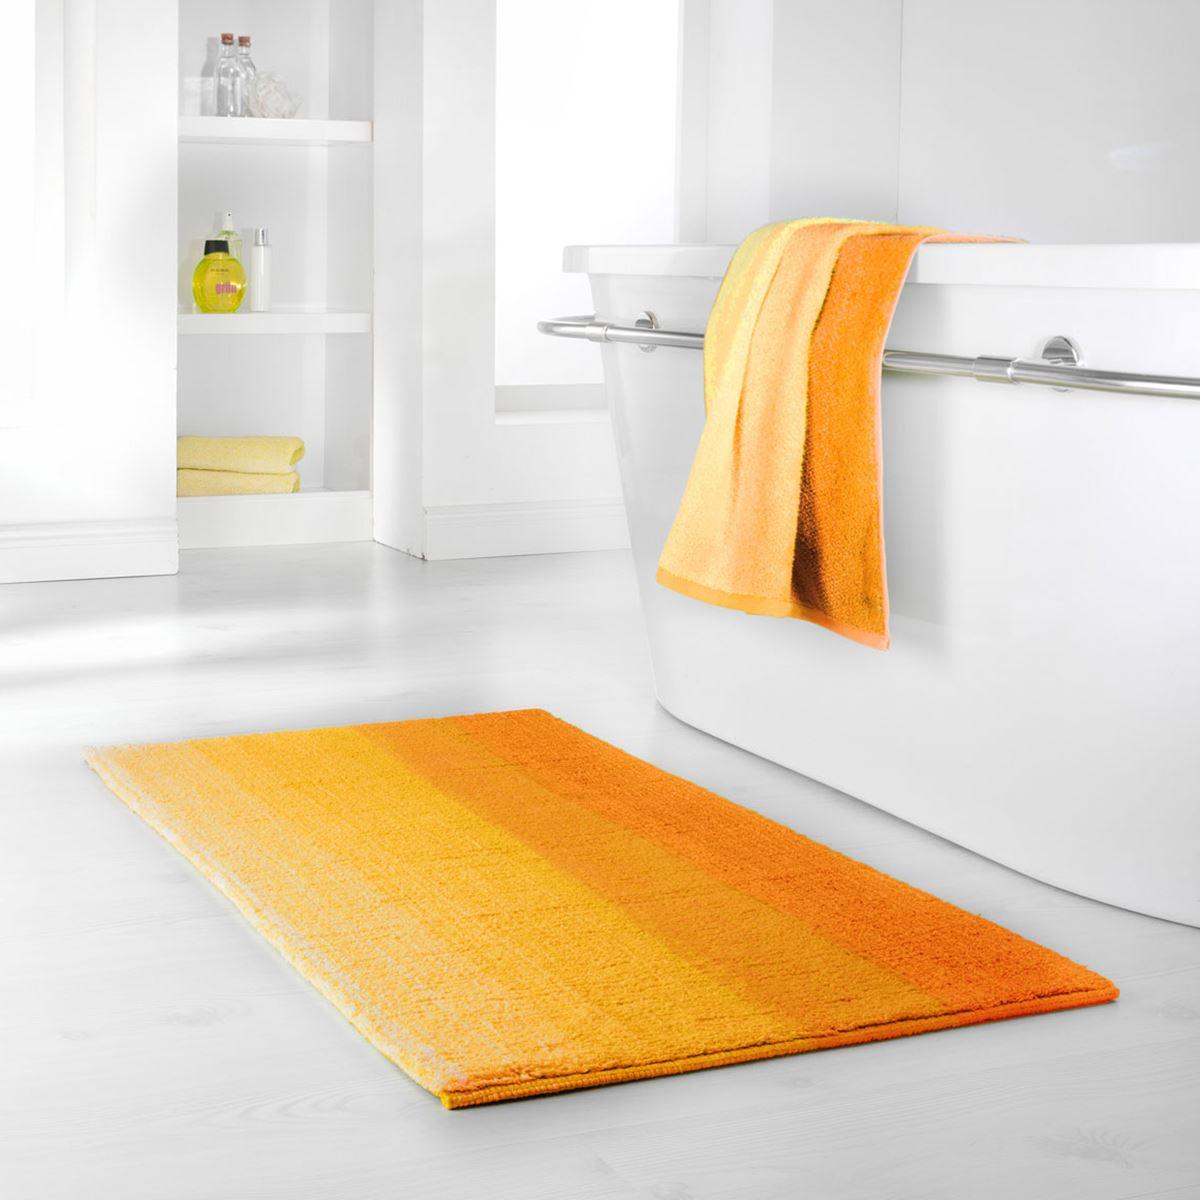 Bath Mats 12x Hotel Quality Bath Mats Towel 100 Organic Cotton Bathroom Rug Bath Matt Home Furniture Diy Tohoku Morinagamilk Co Jp